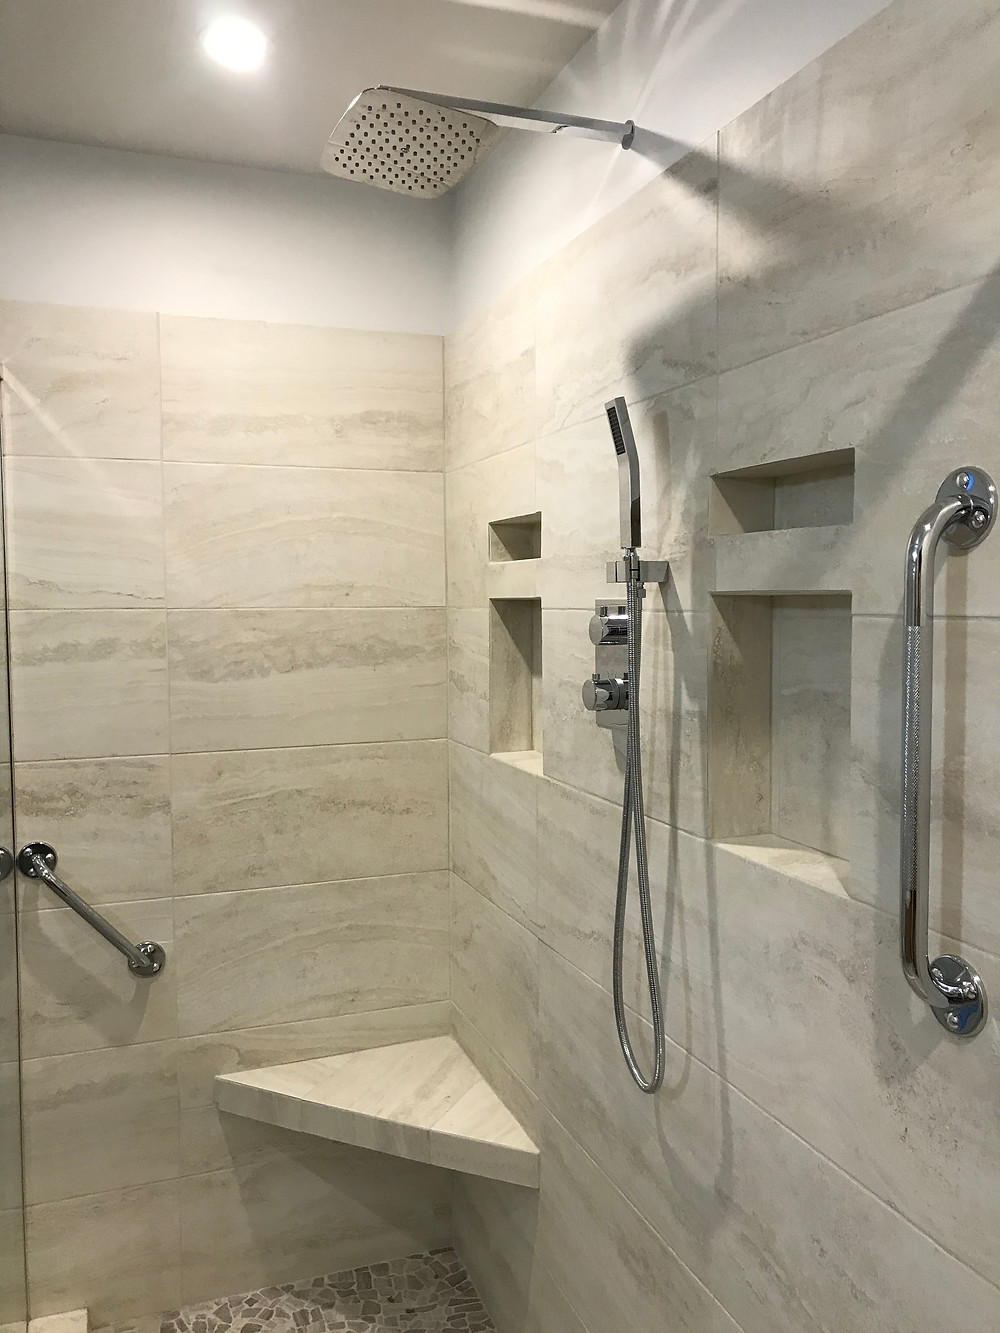 Tile installation mitred edges shower